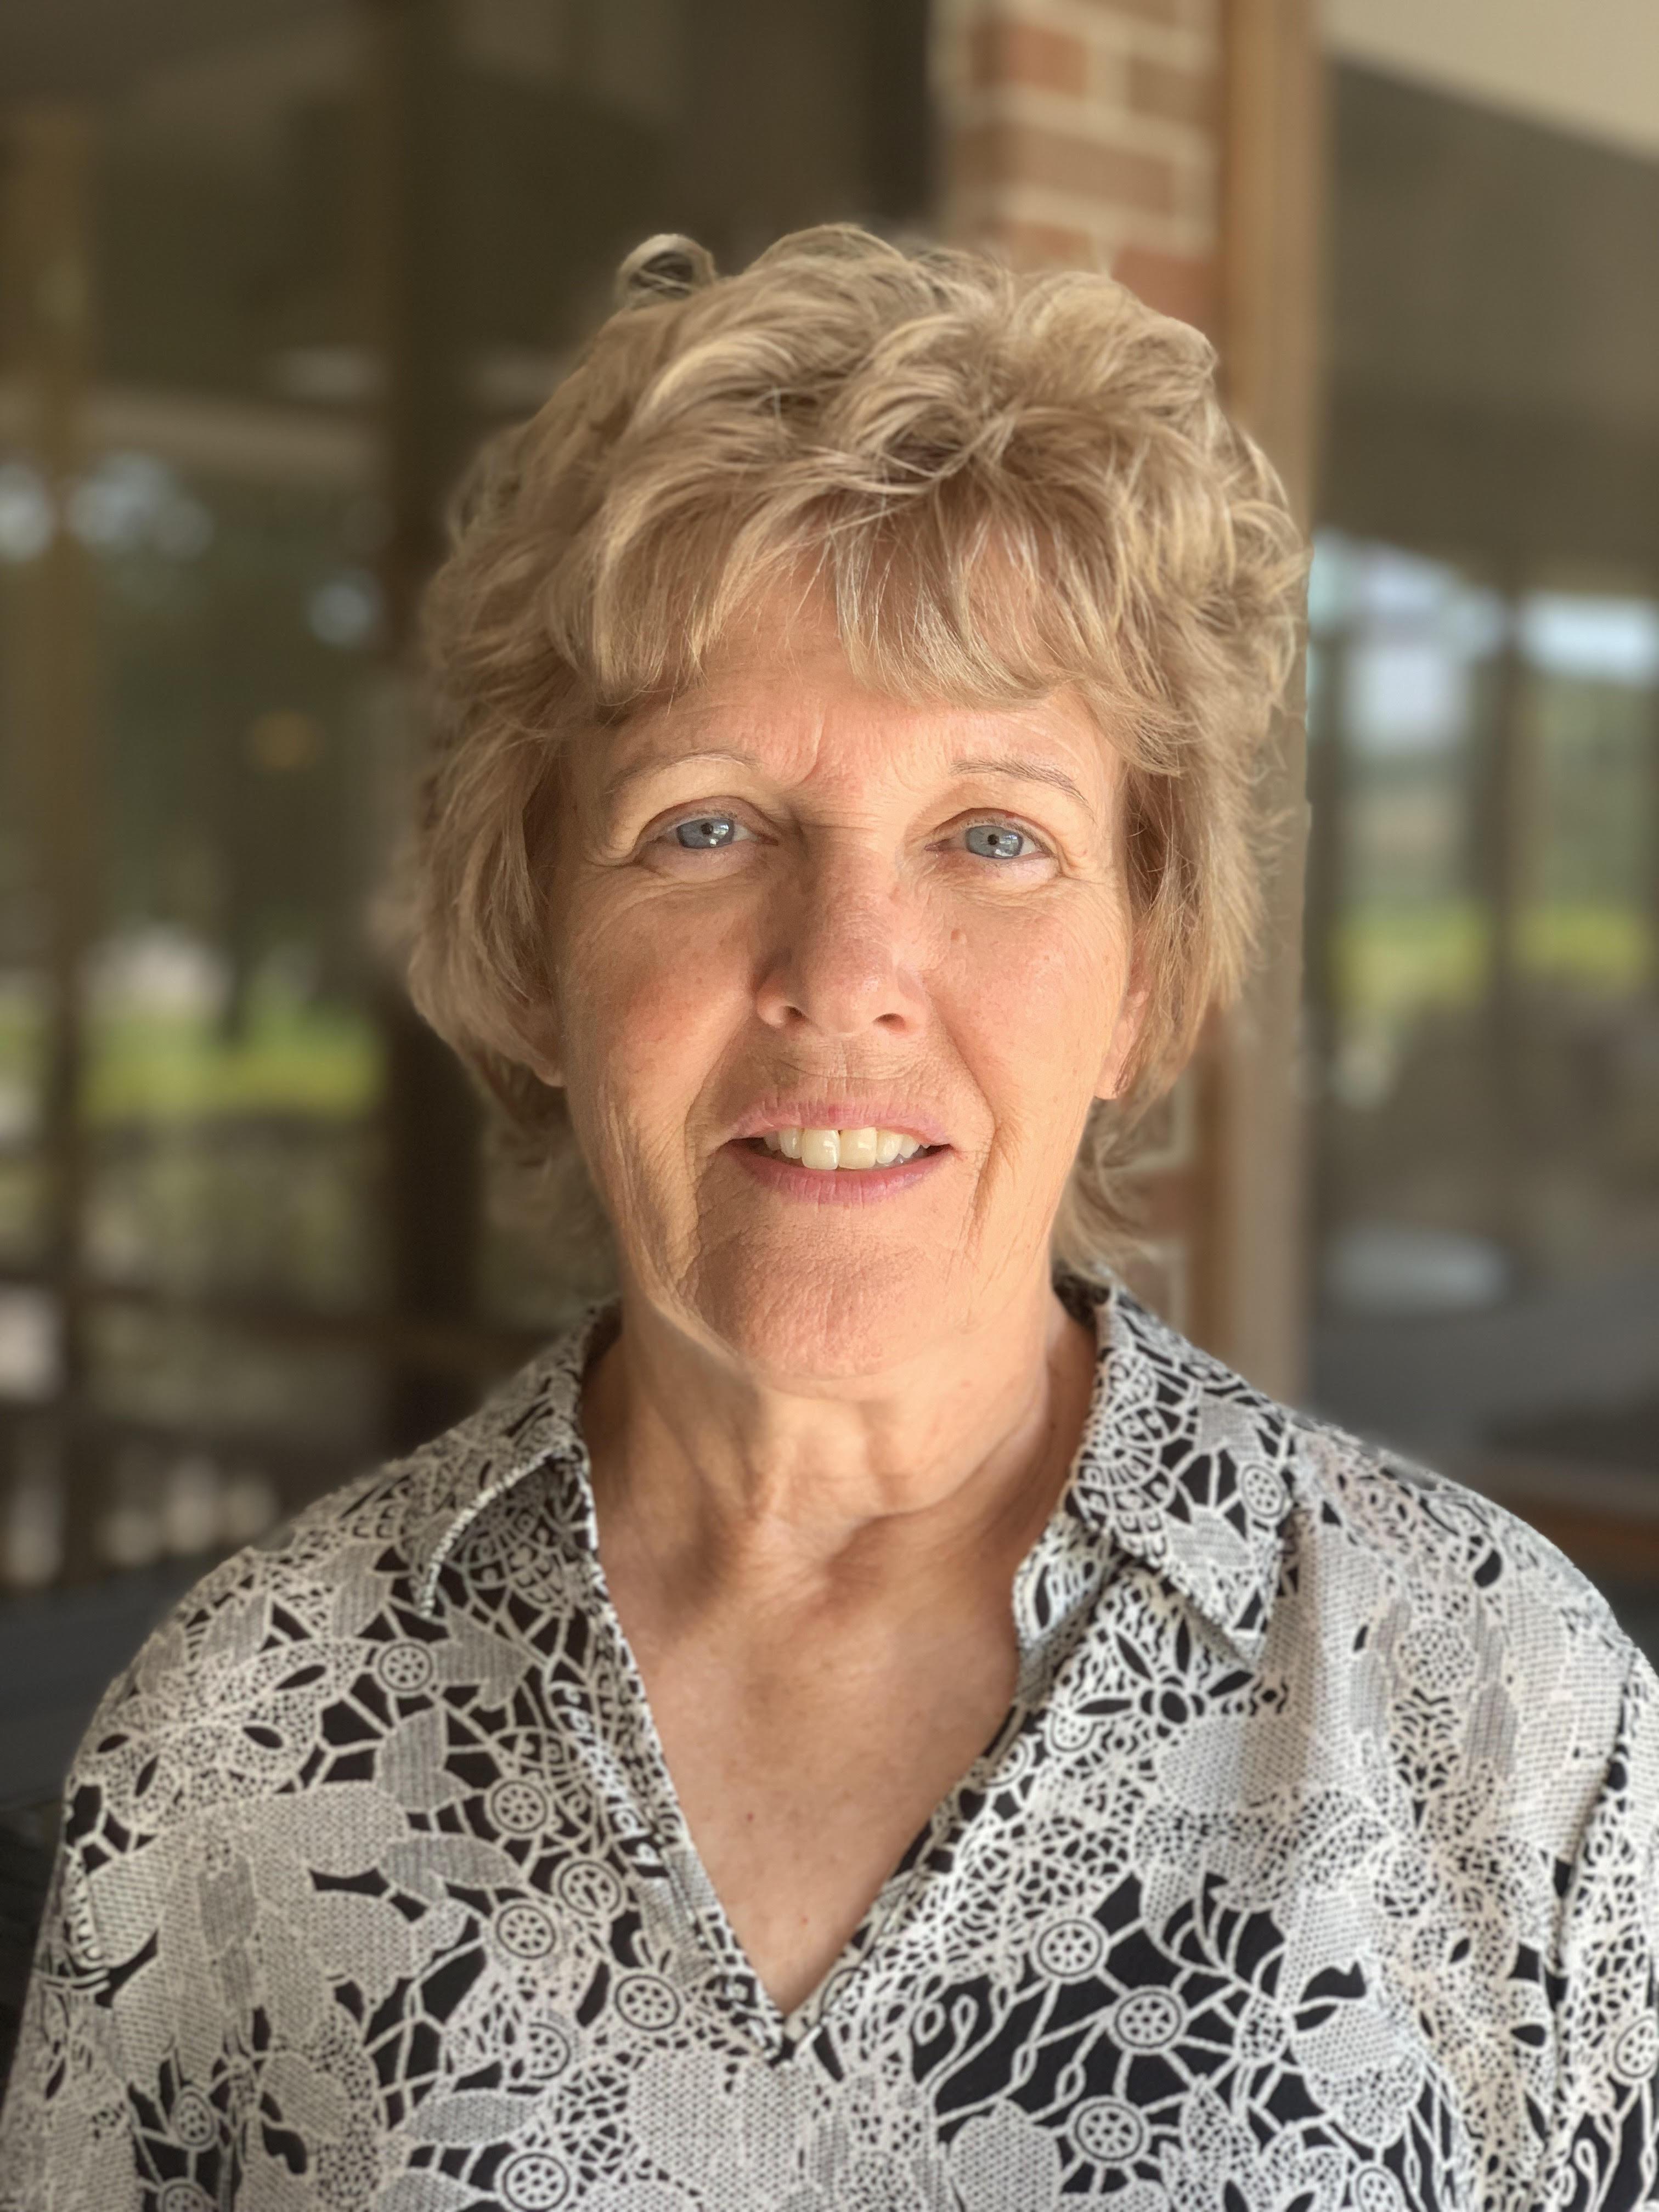 Phyllis Hupe